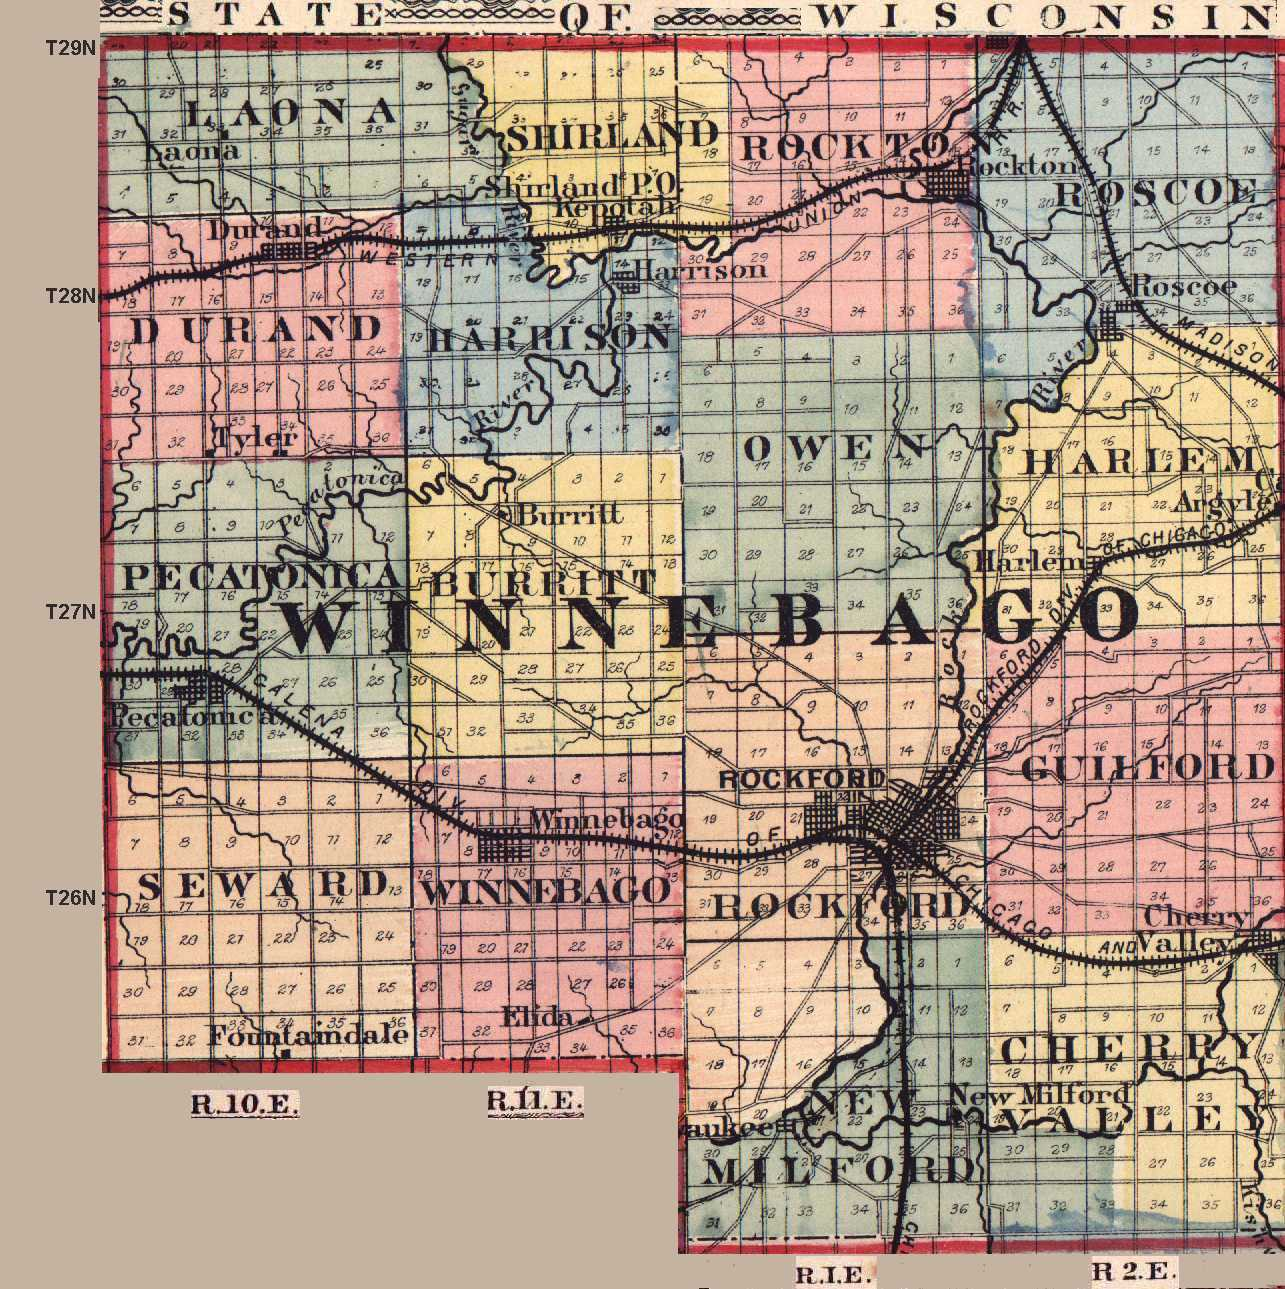 Winnebago County Illinois Maps And Gazetteers - Michigan land ownership maps